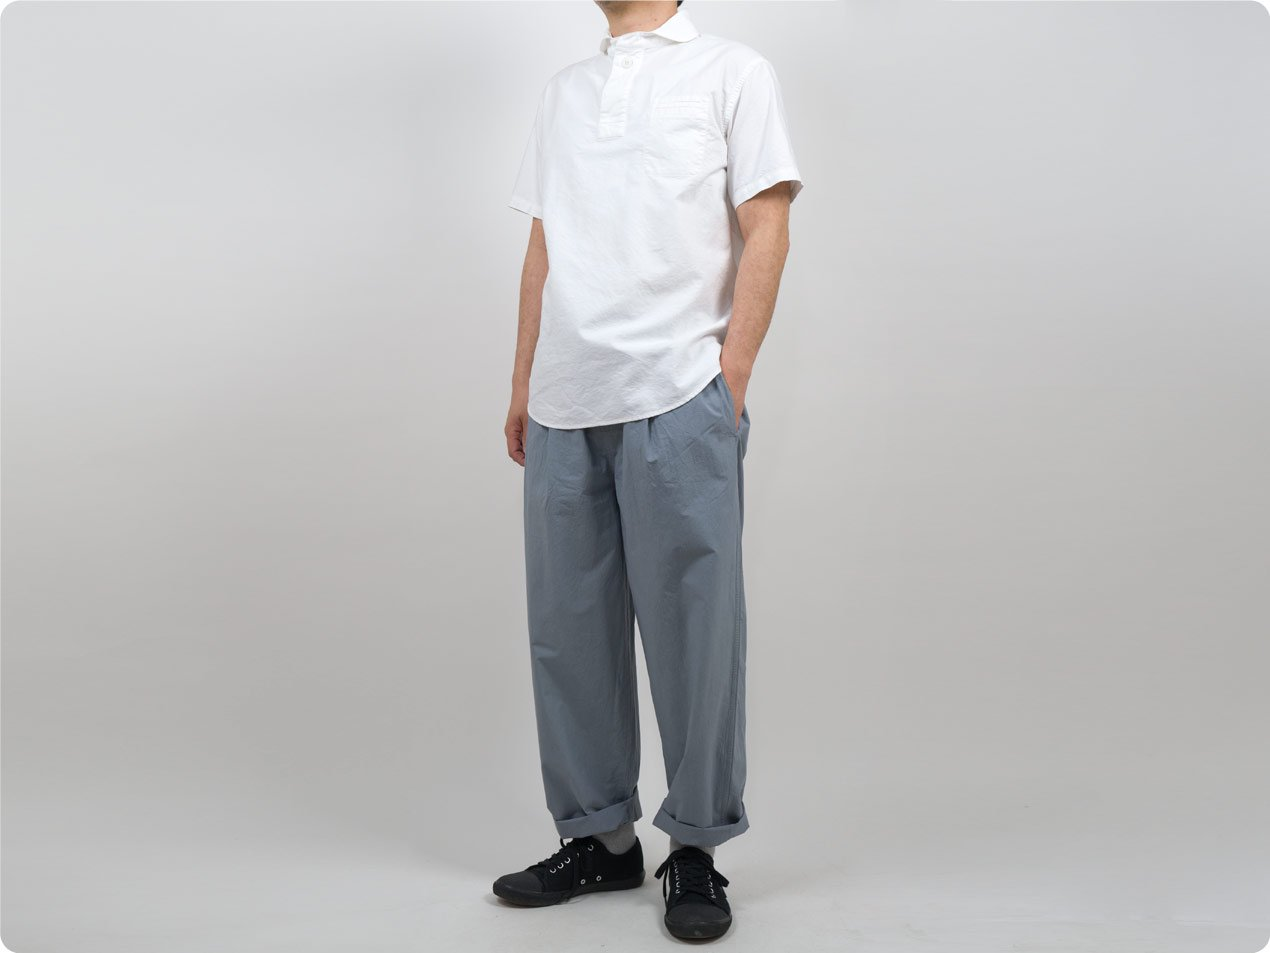 LOLO コットンプルオーバーシャツ 半袖 WHITE